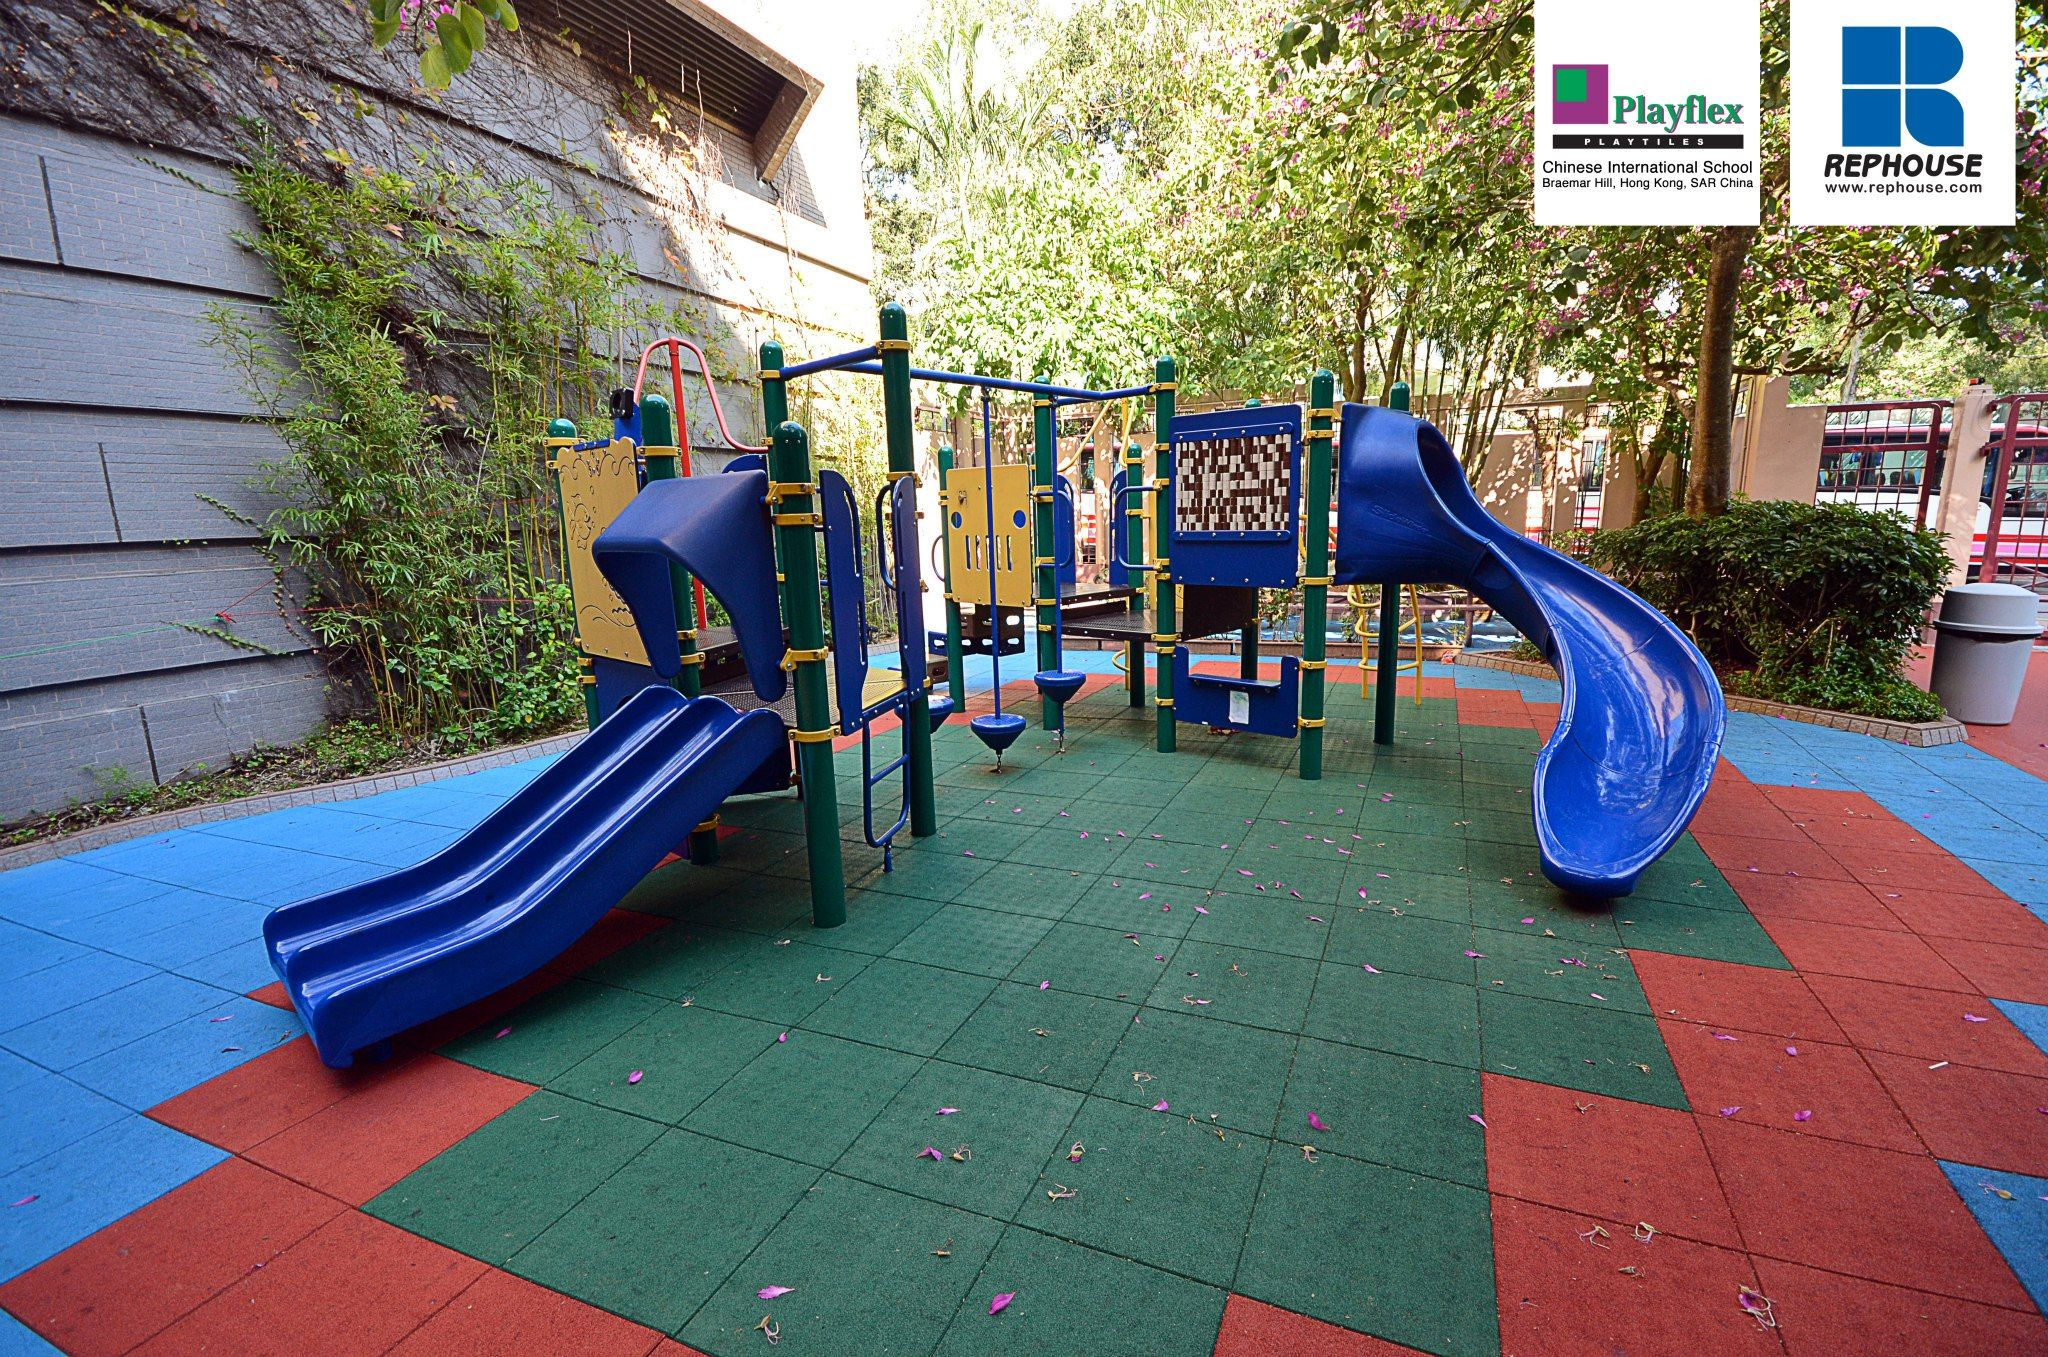 Playflex Royal Playground Safety Tiles Chinese